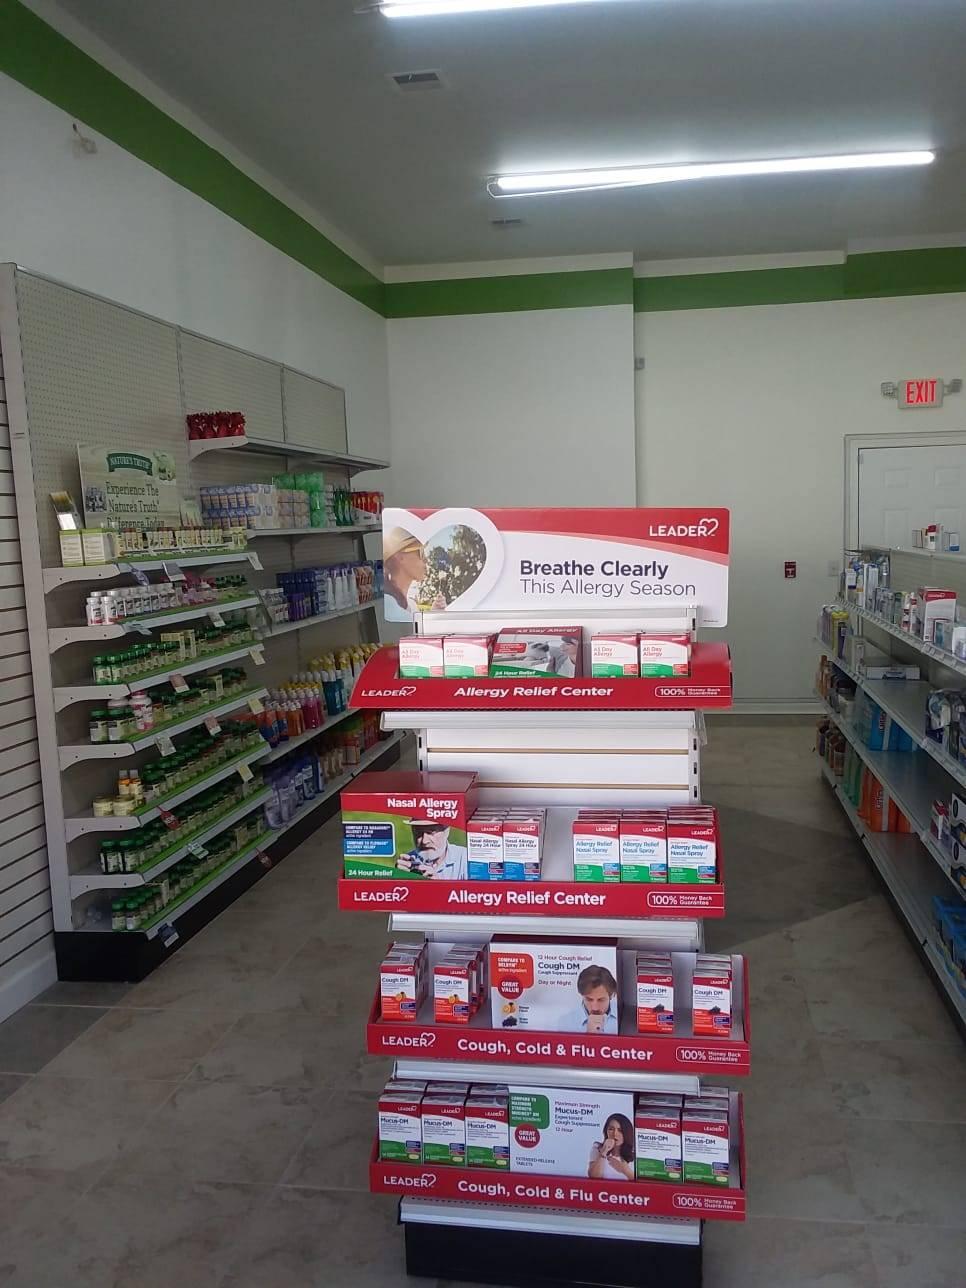 Palisade Rx Pharmacy - pharmacy  | Photo 4 of 14 | Address: 296 Palisade Ave, Jersey City, NJ 07307, USA | Phone: (201) 292-1517